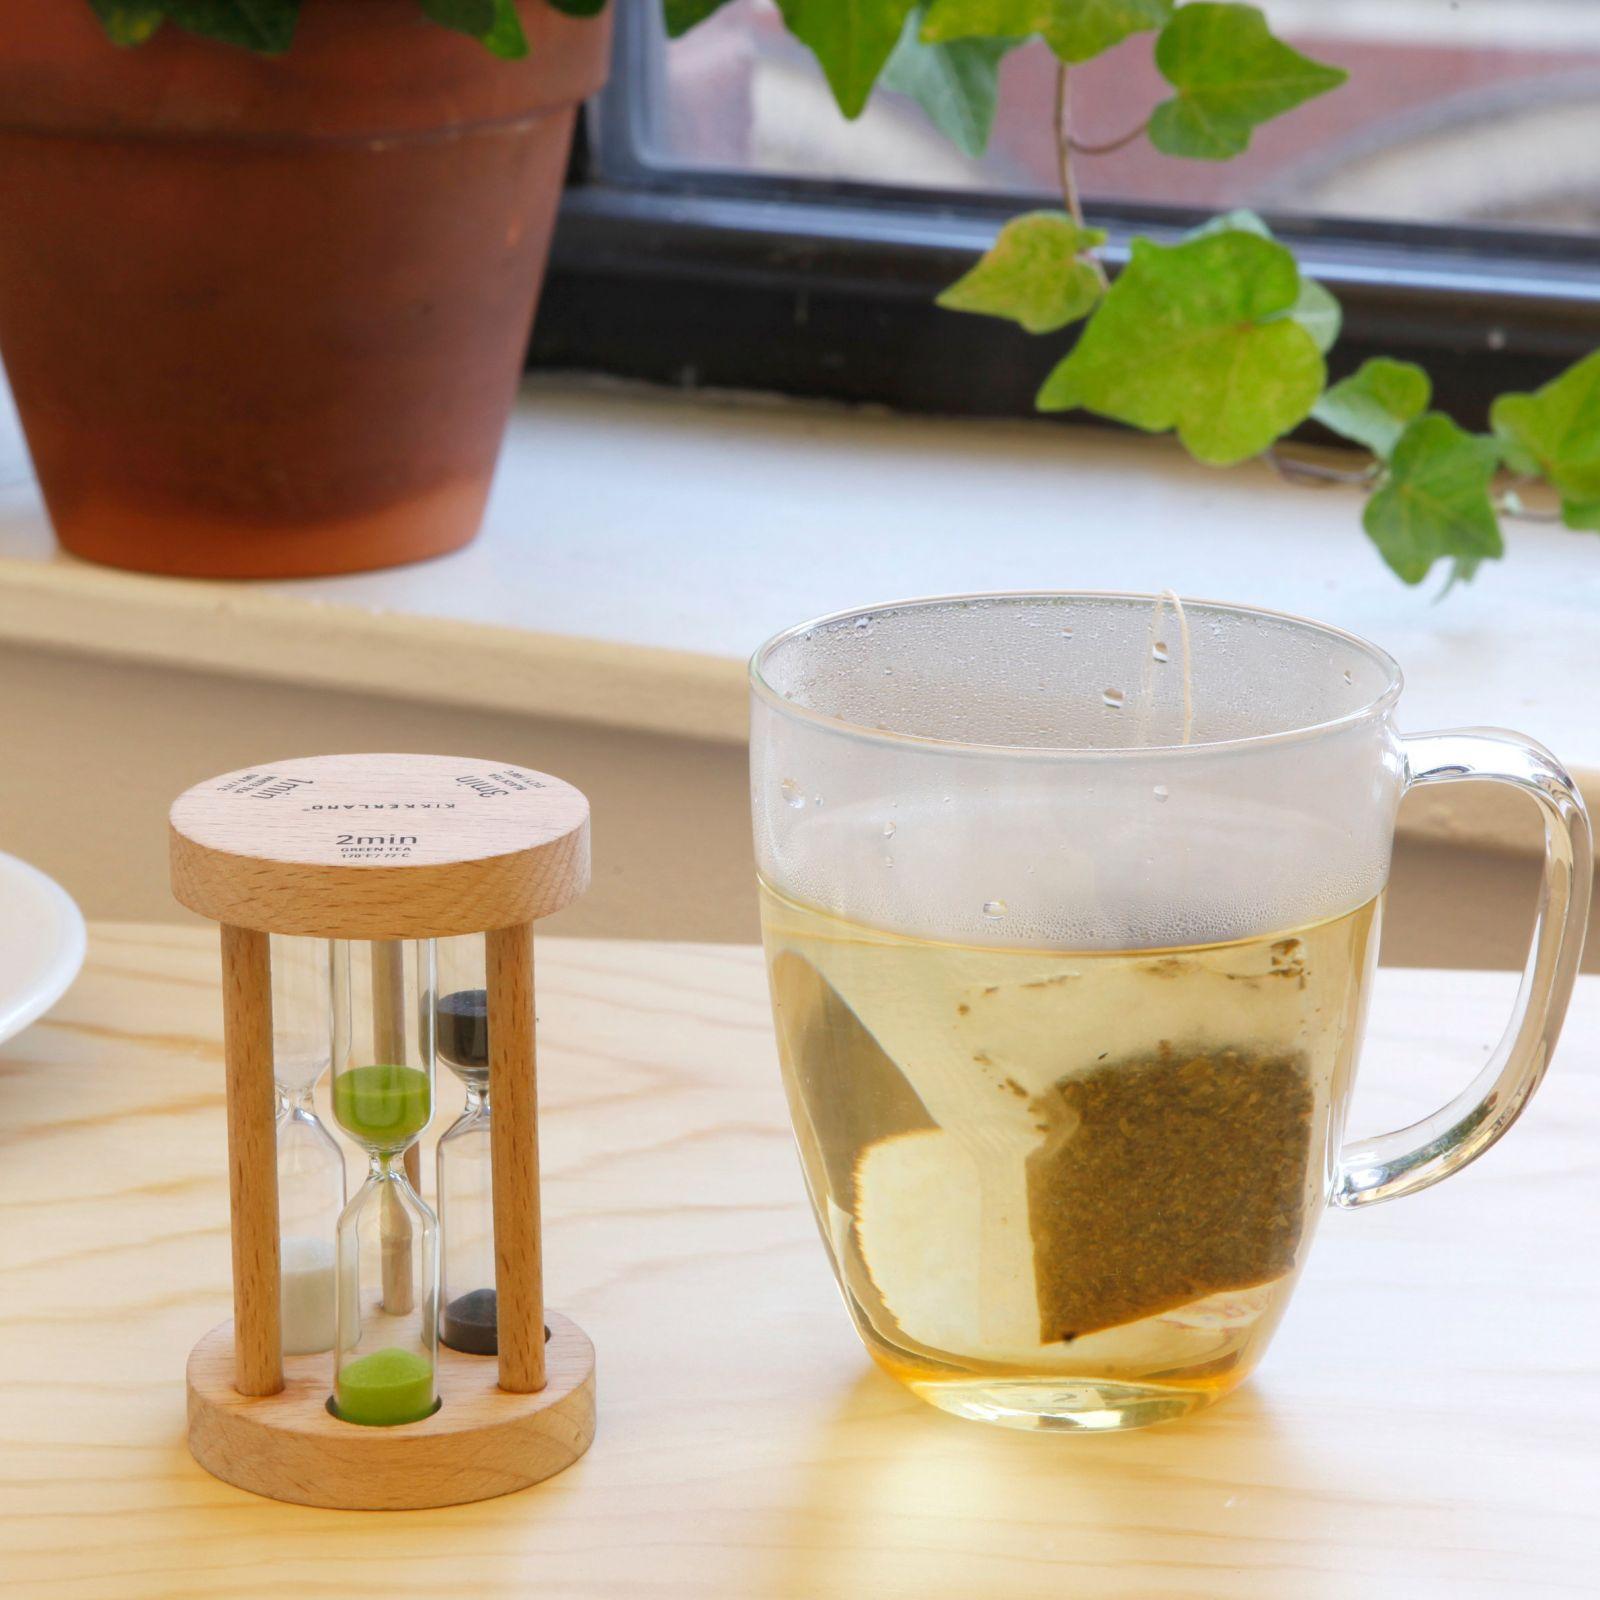 sablier à thé kikkerland